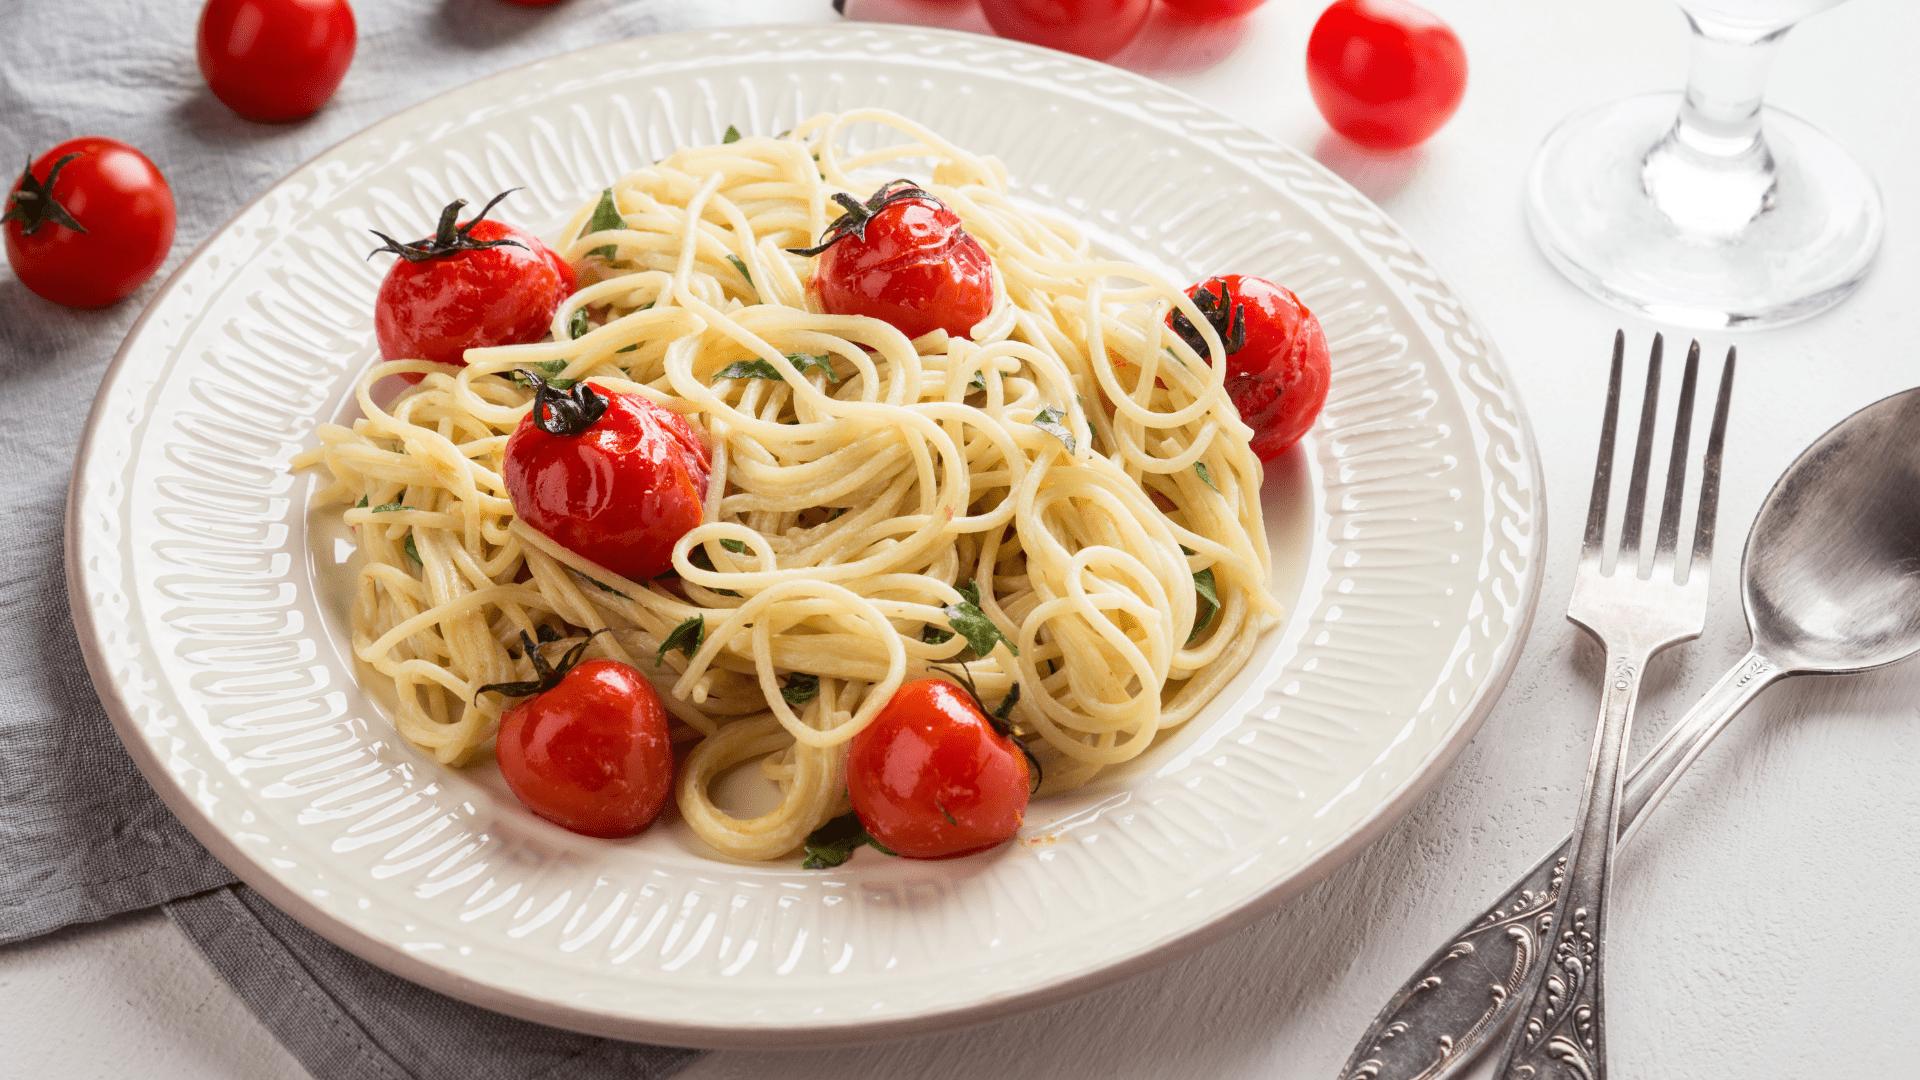 Pasta con queso feta y tomates cherry: la receta que ha revolucionado TikTok